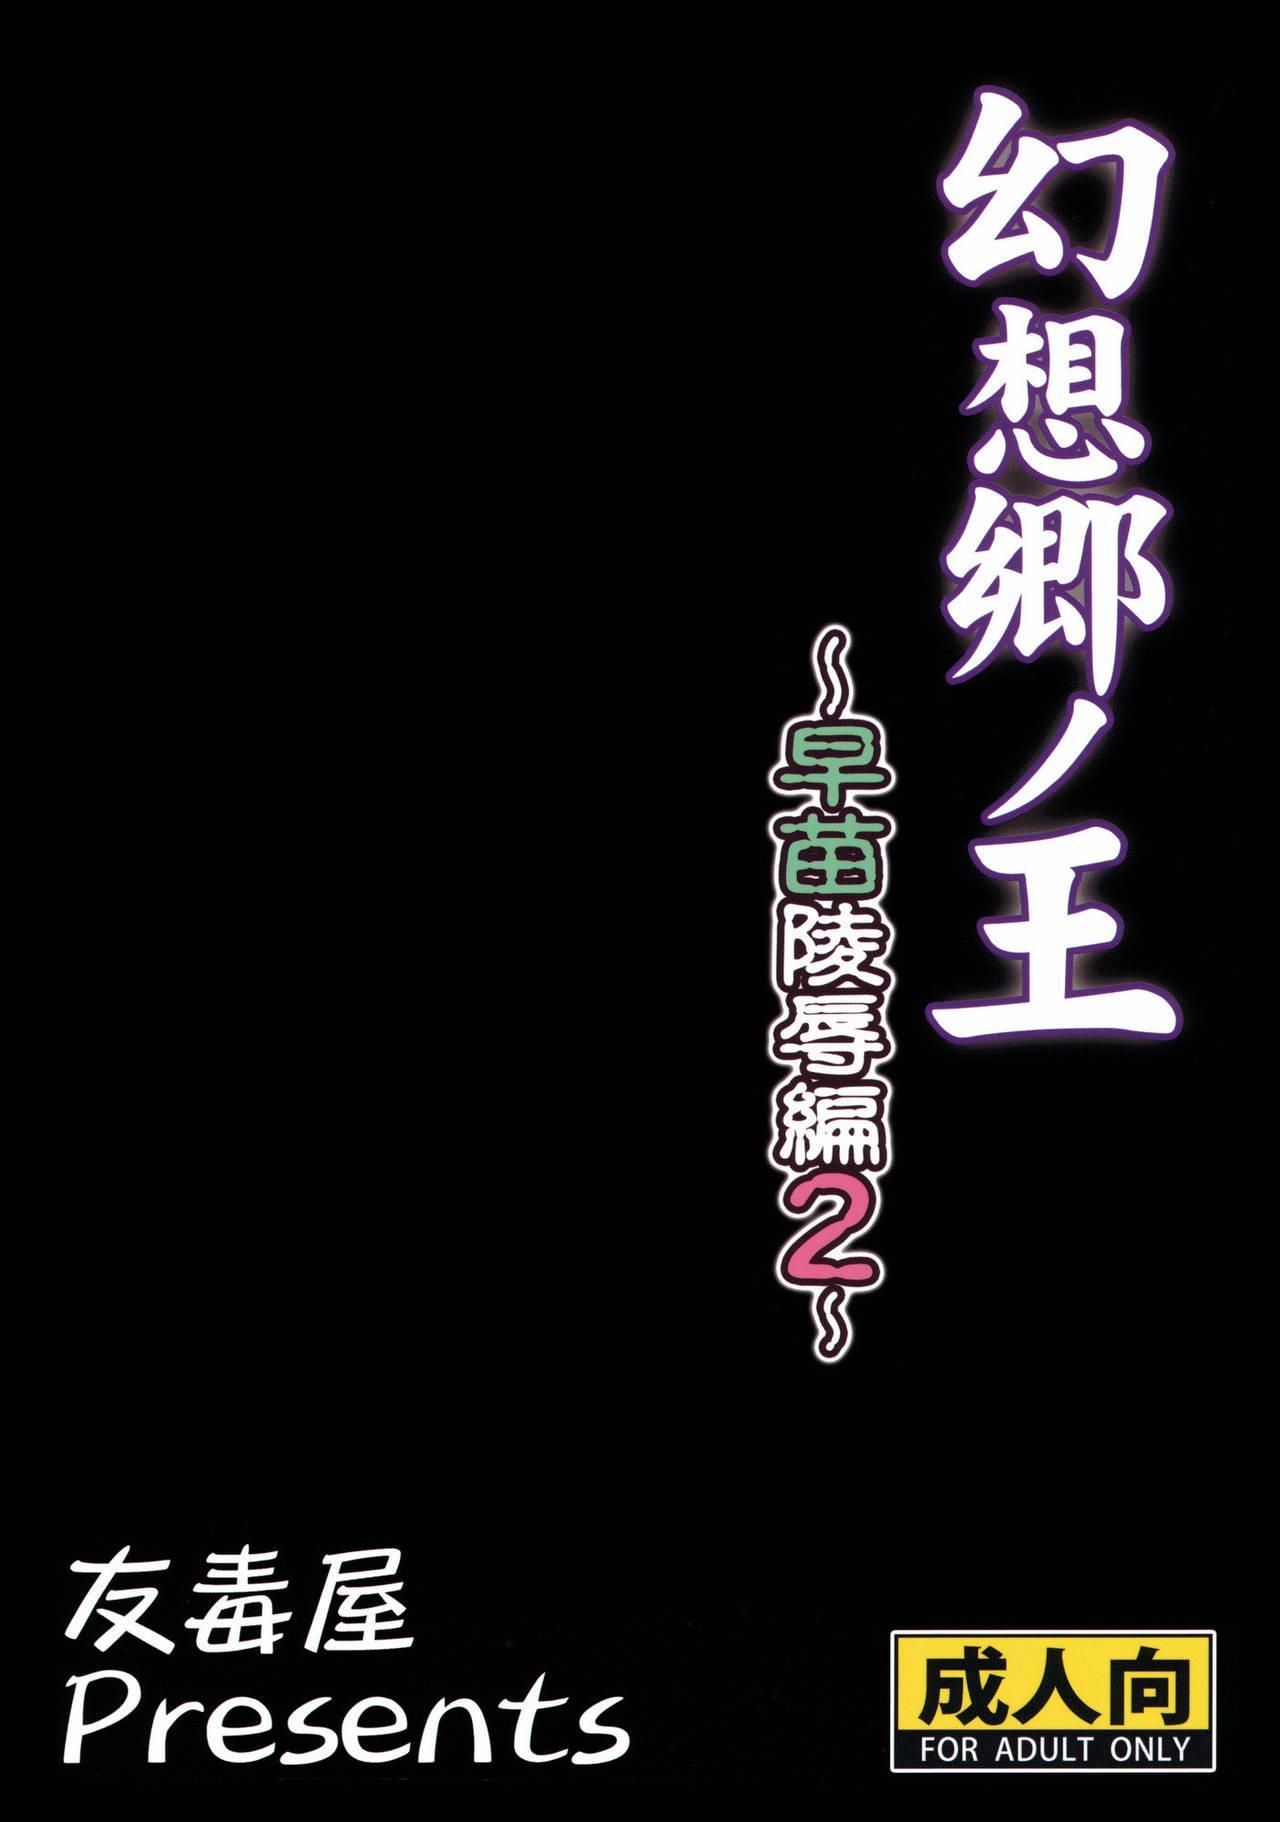 Gensoukyou no Ou Sanae Ryoujoku Hen 2 27